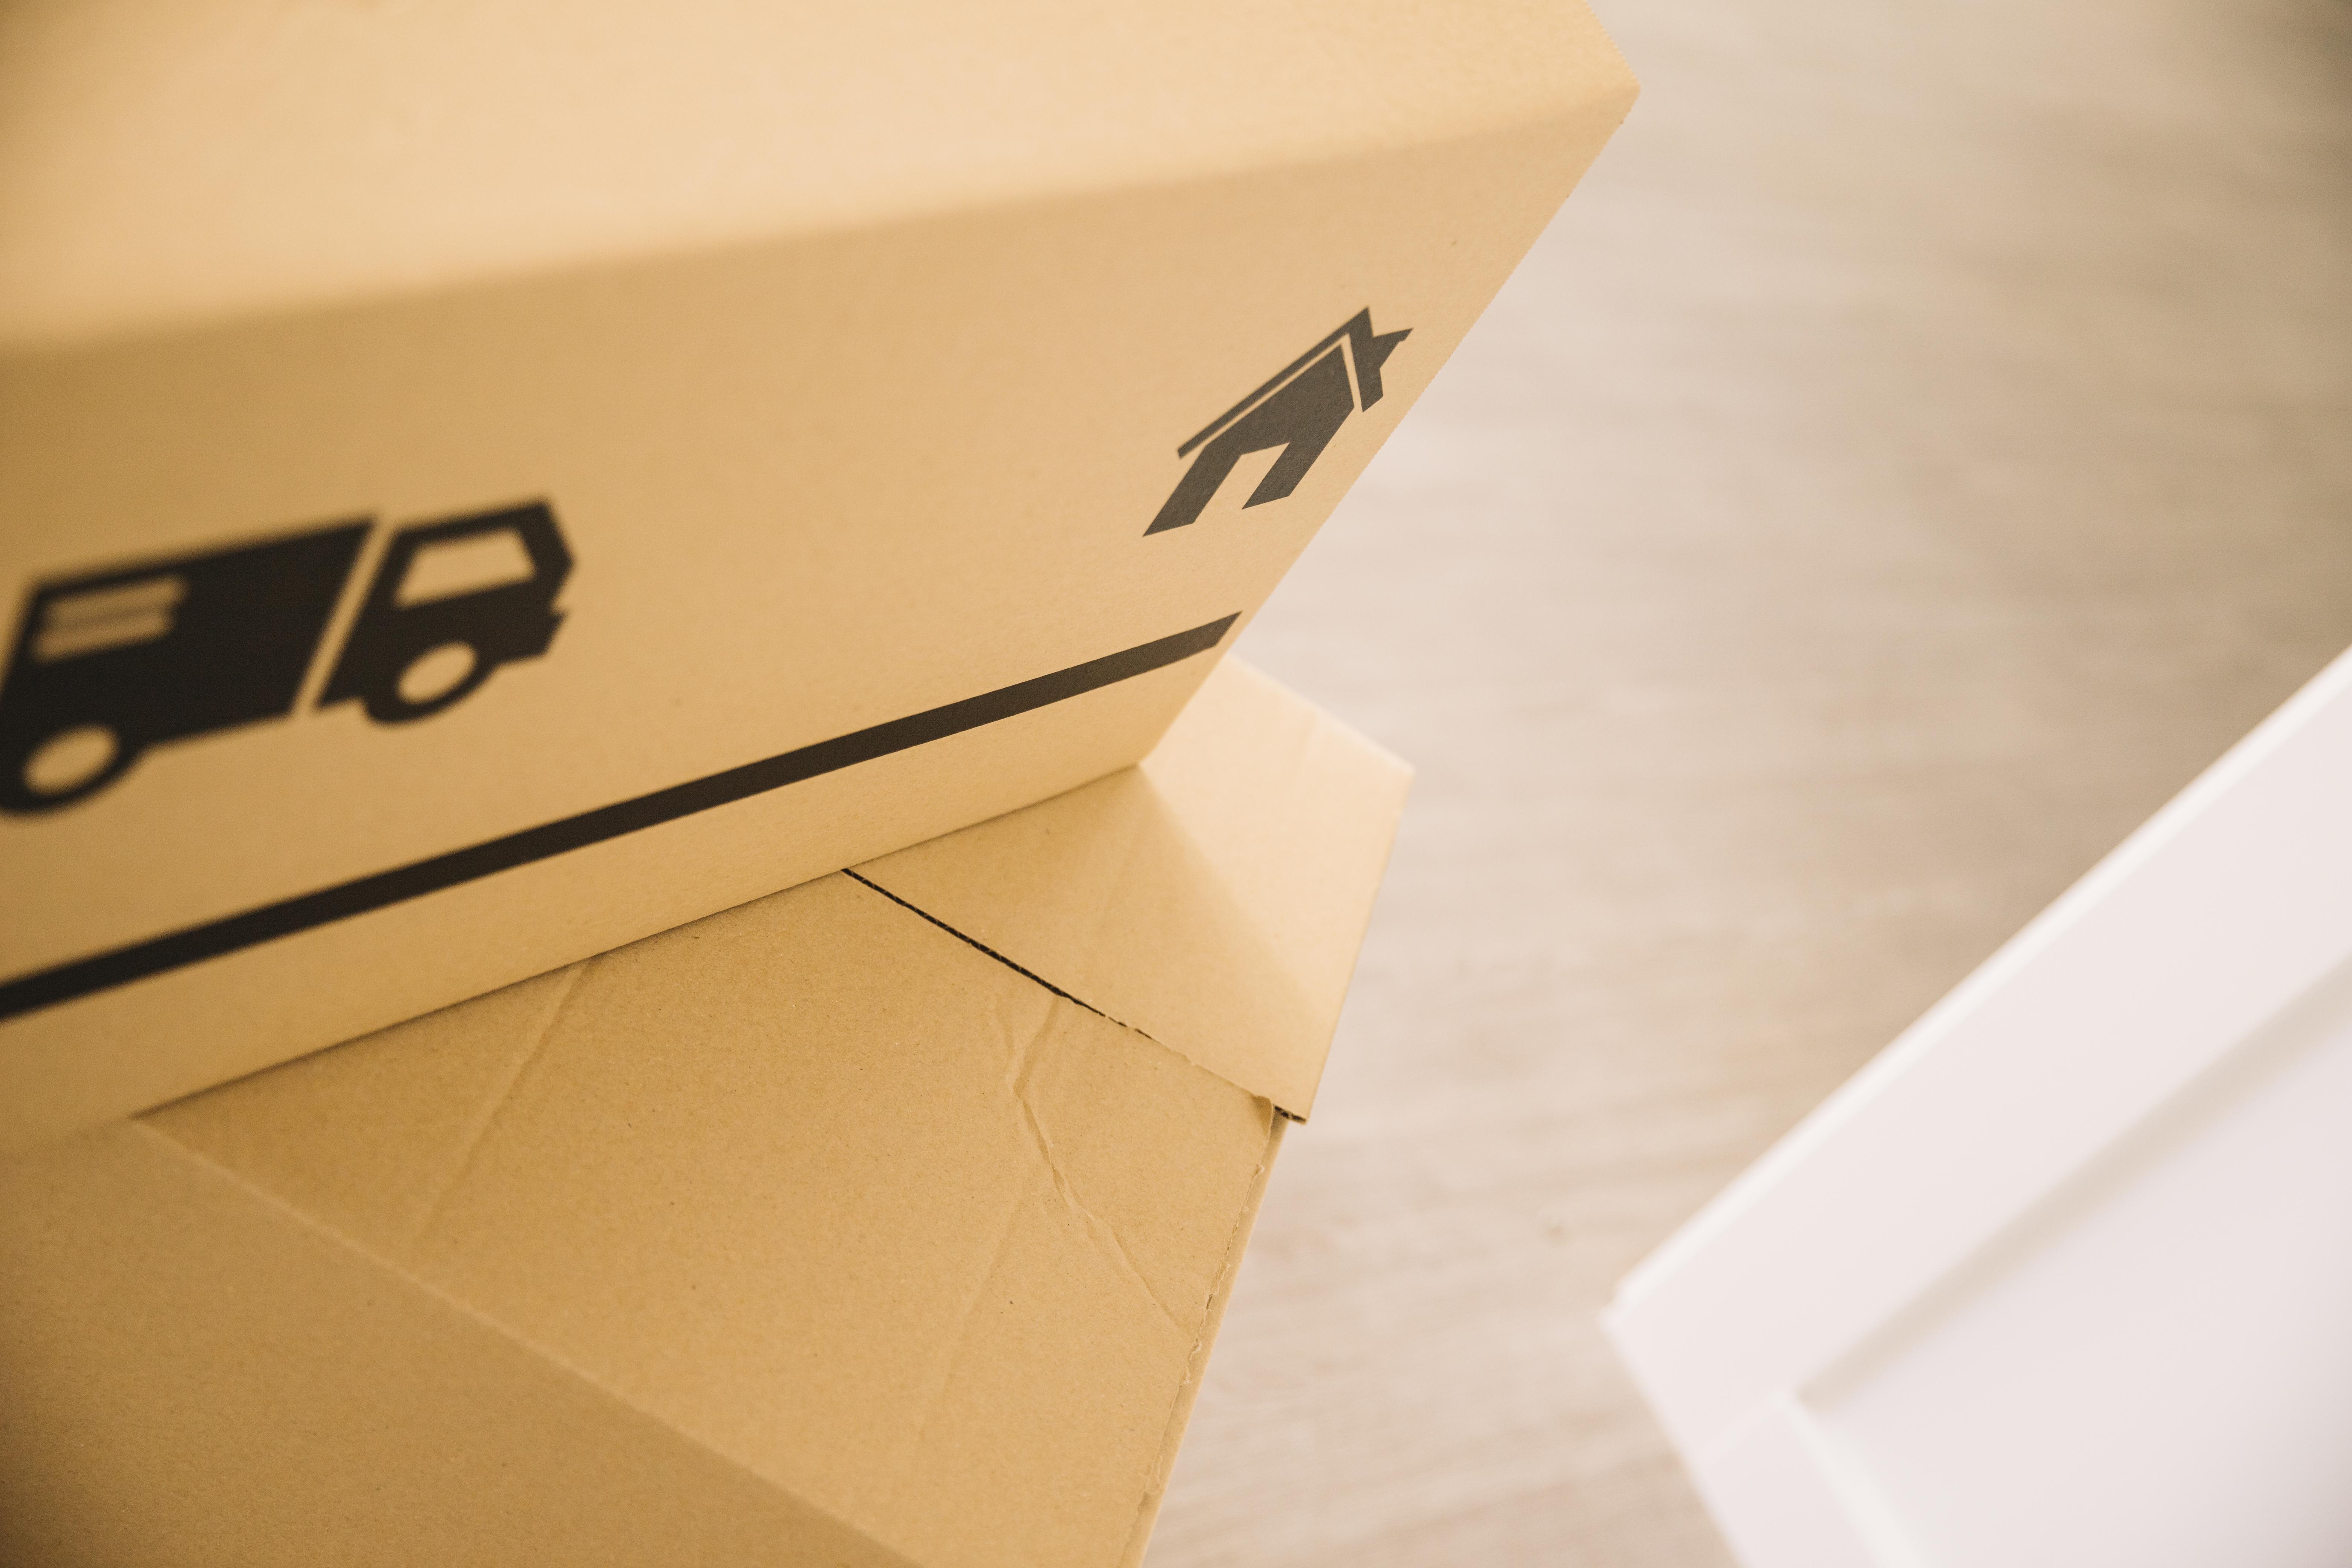 Empresas da China Usam Delivery para Evitar Contágio do Corona